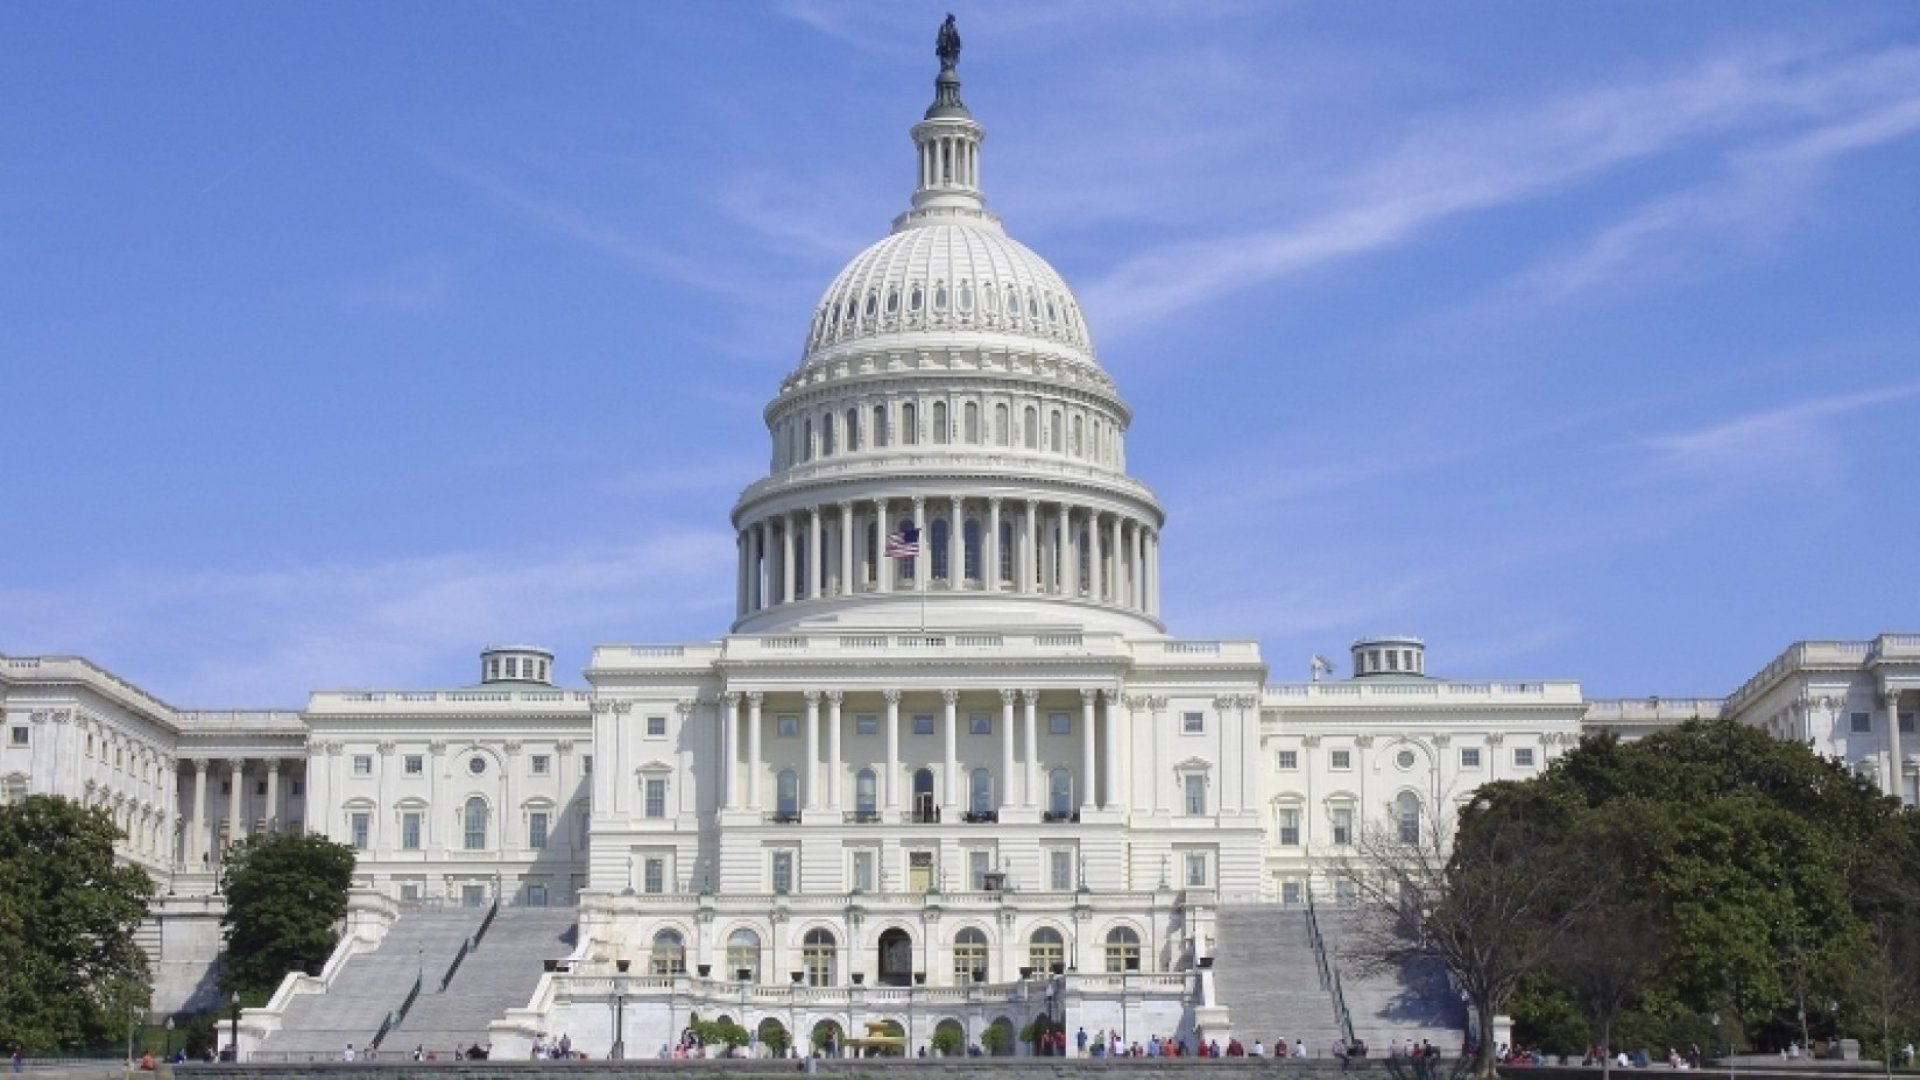 Senator Tim Kaine Shares His Thoughts on Leadership